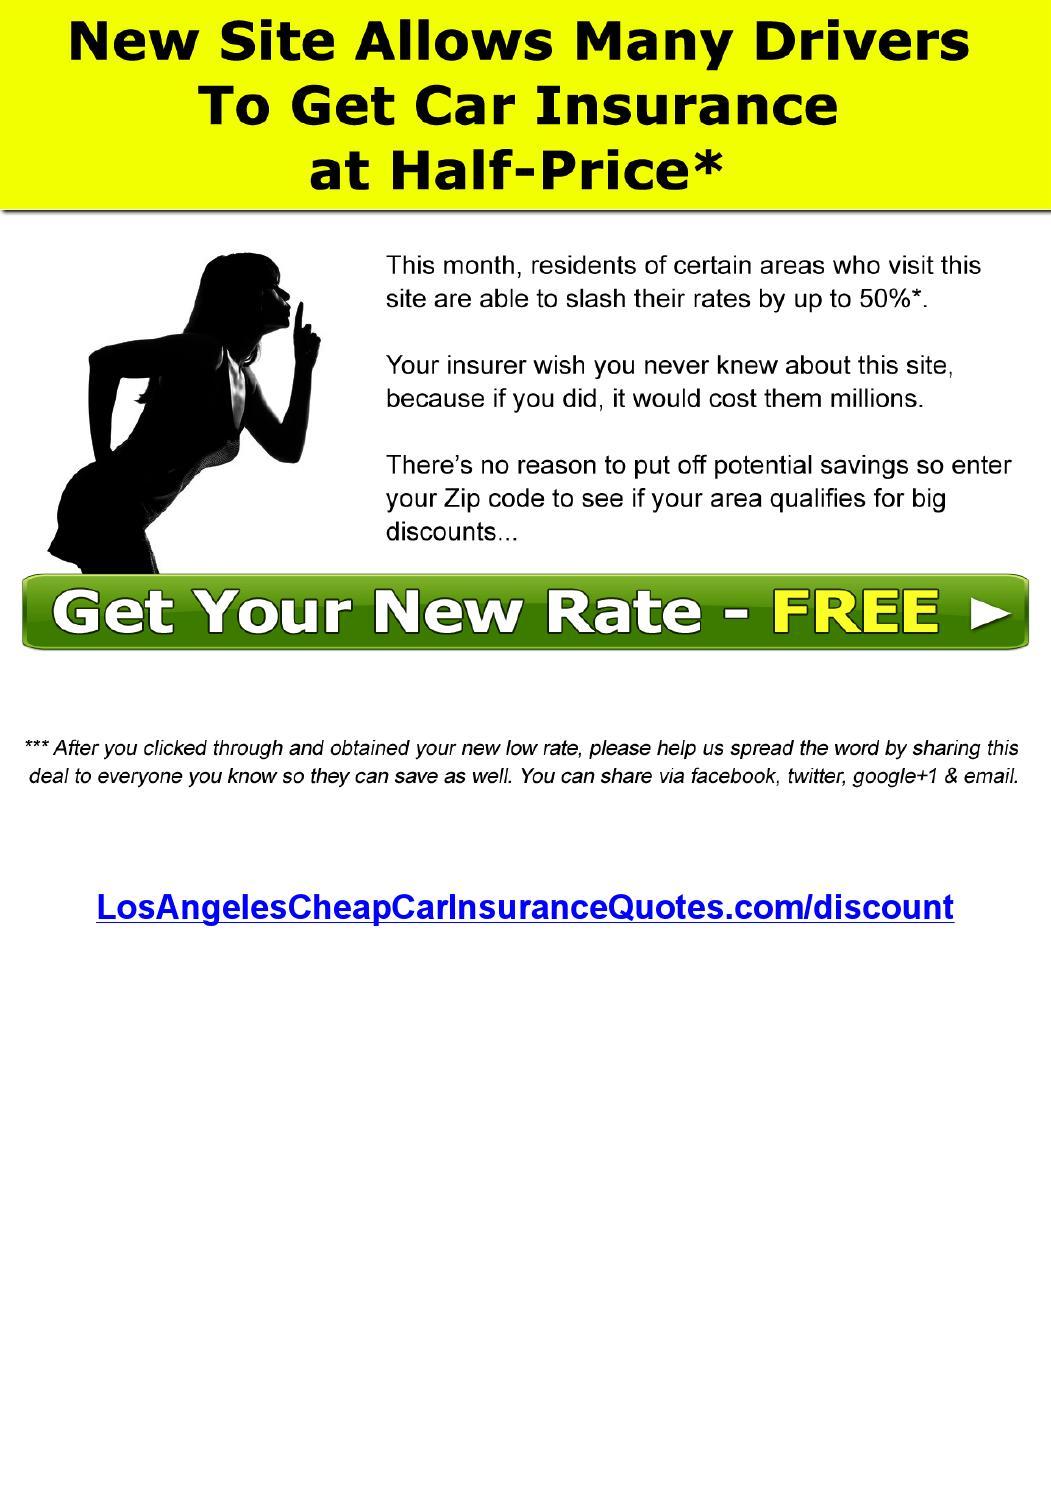 LA California Car Insurance